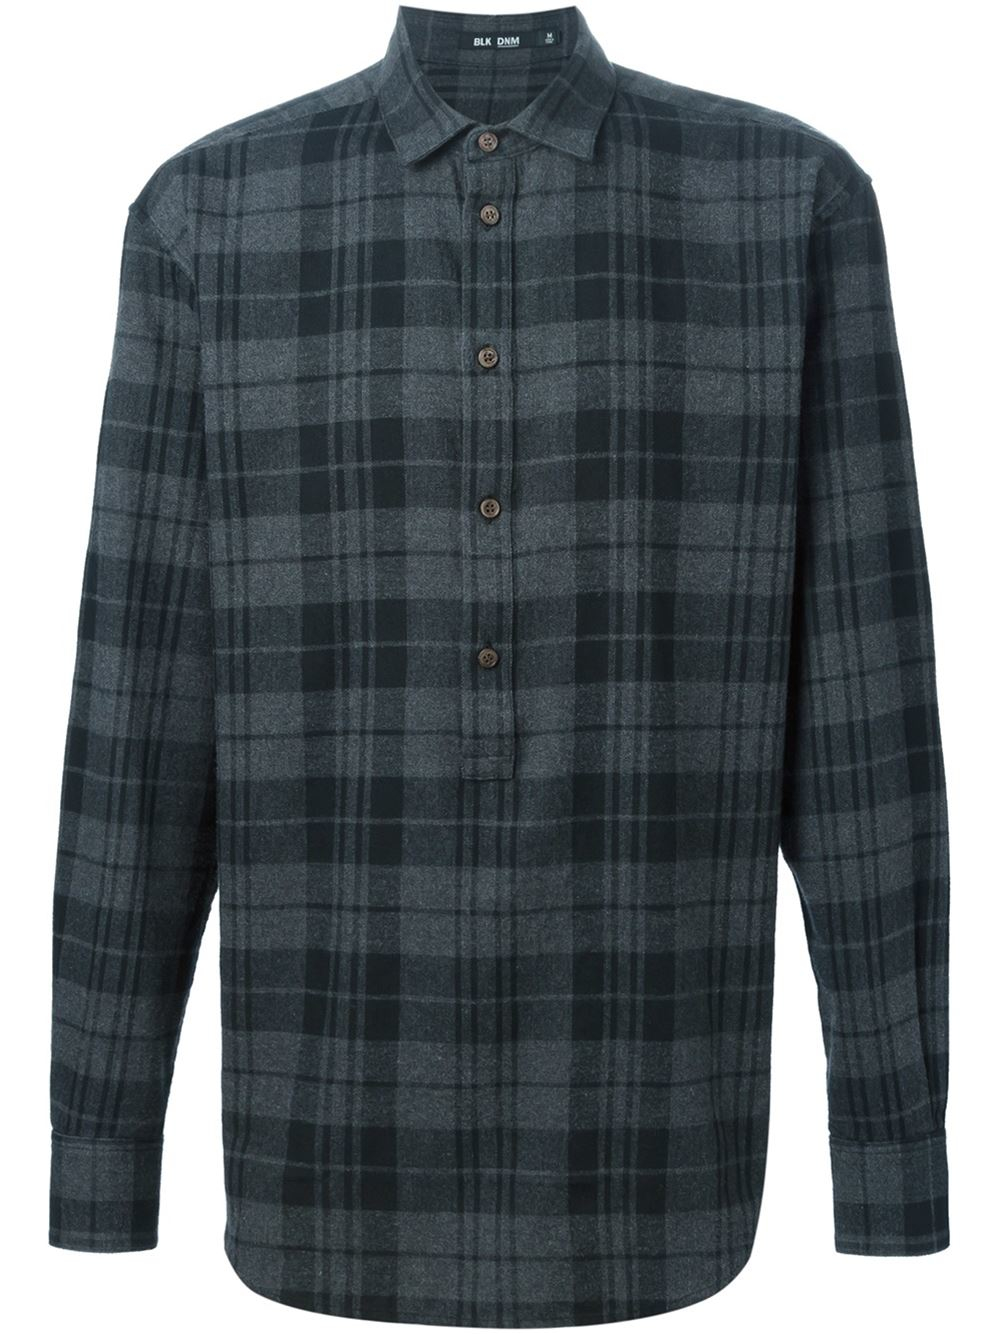 Blk dnm plaid shirt in gray for men grey lyst for Grey plaid shirt womens